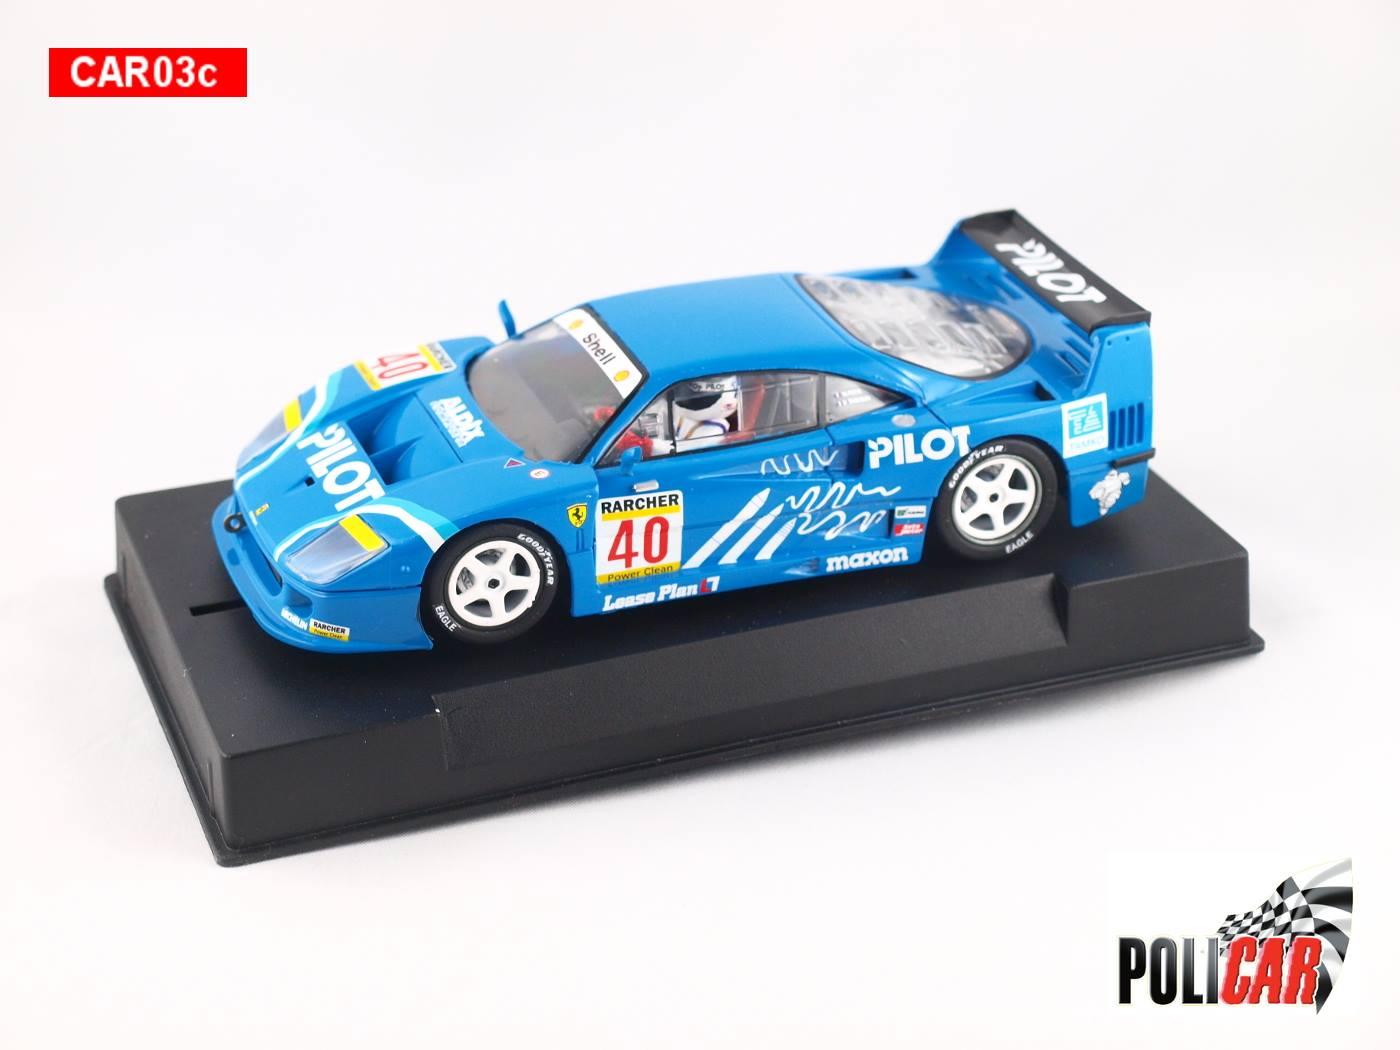 Policar: la Ferrari 40 2nd Silverstone 1995 - CAR03c est annoncée